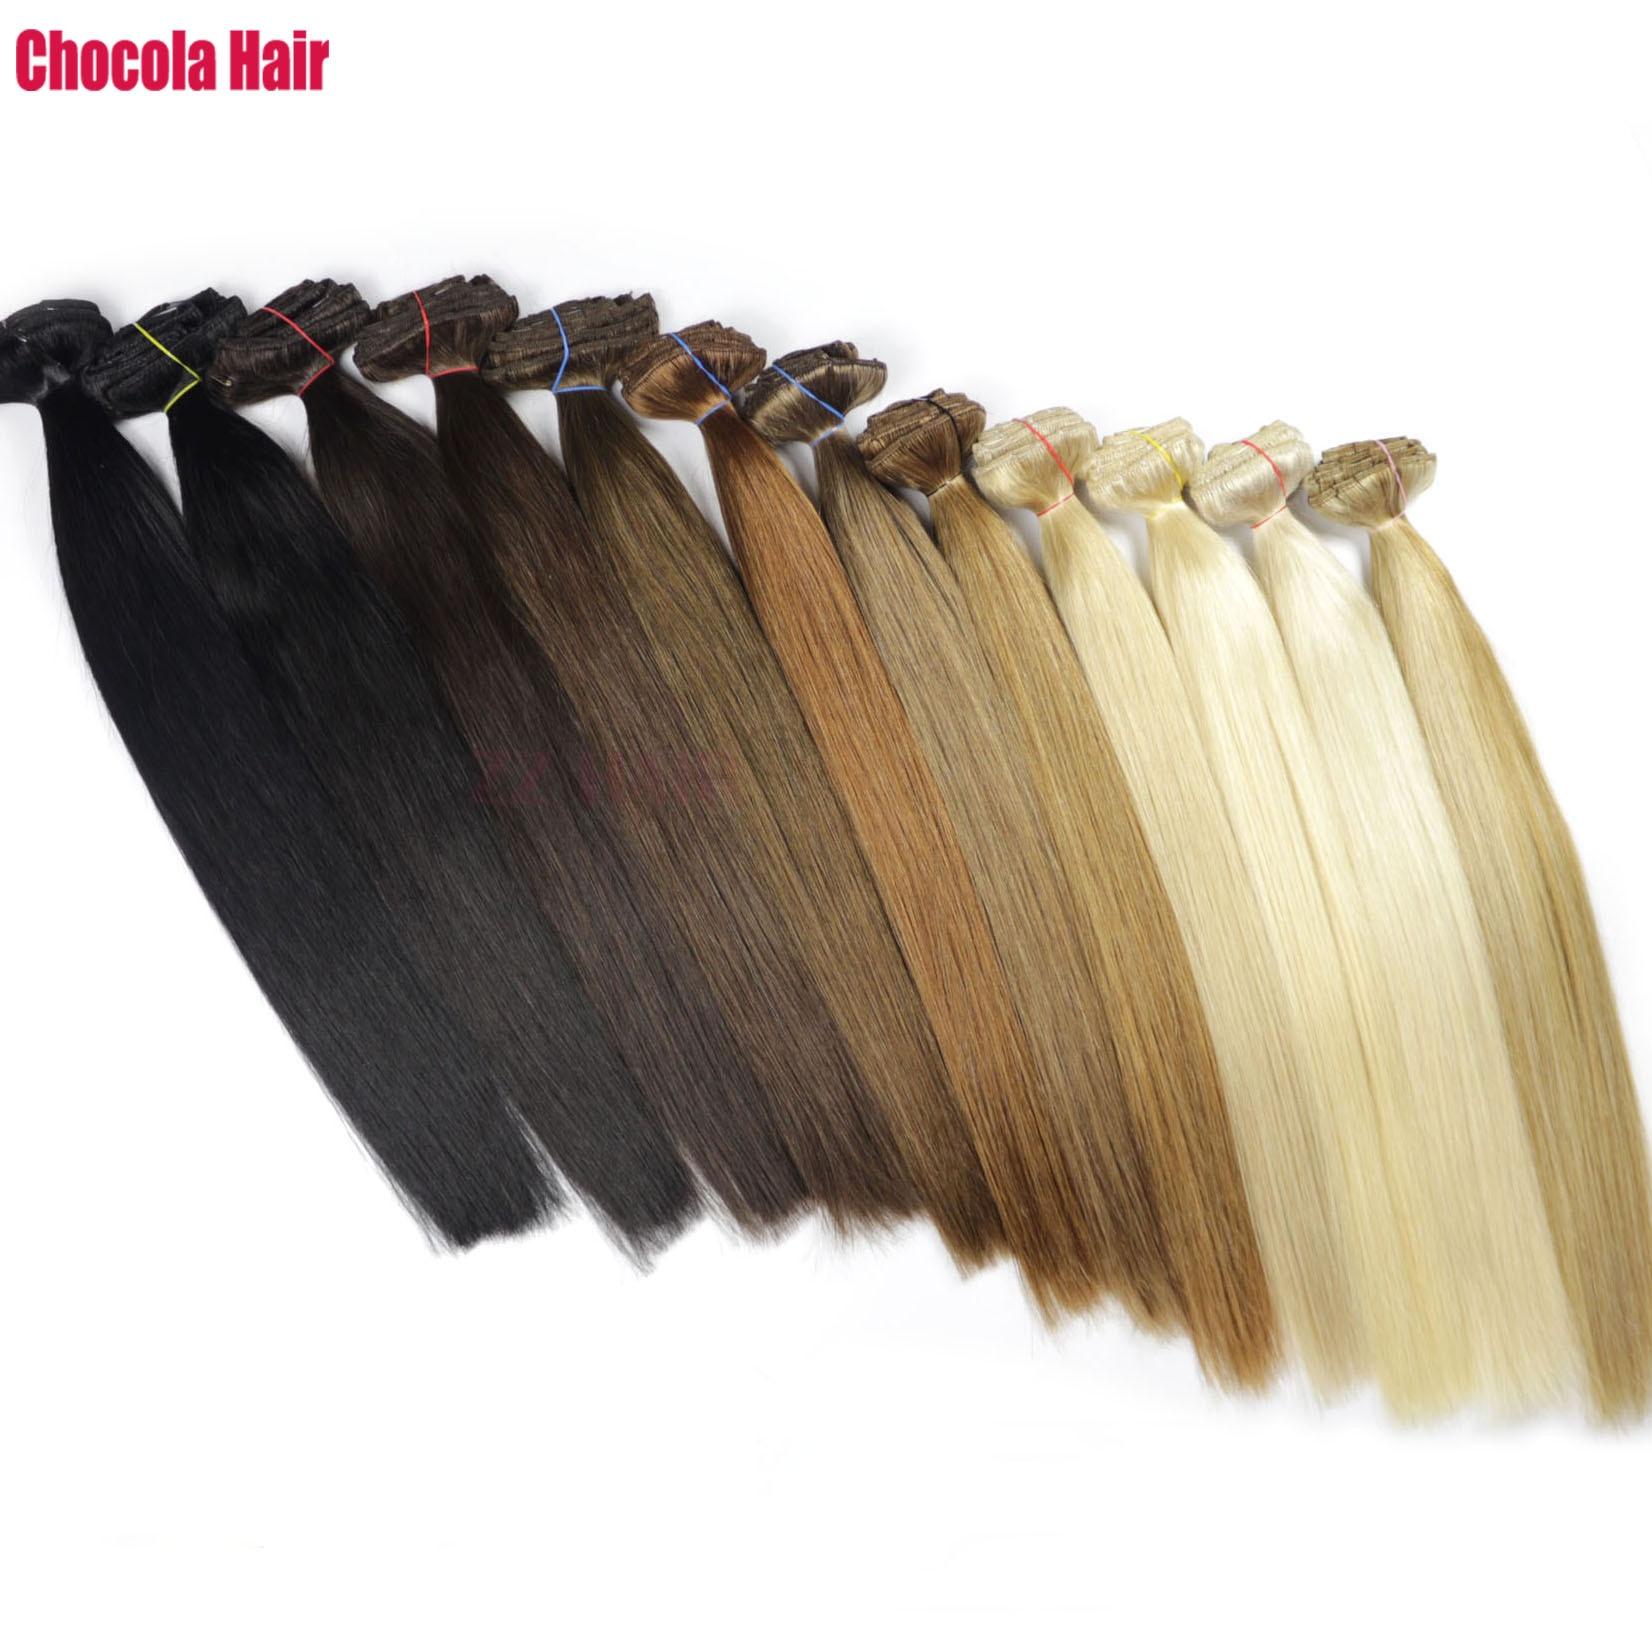 Chocola Full Head Brazilian Machine Made Remy Hair 10pcs Set 180g 16